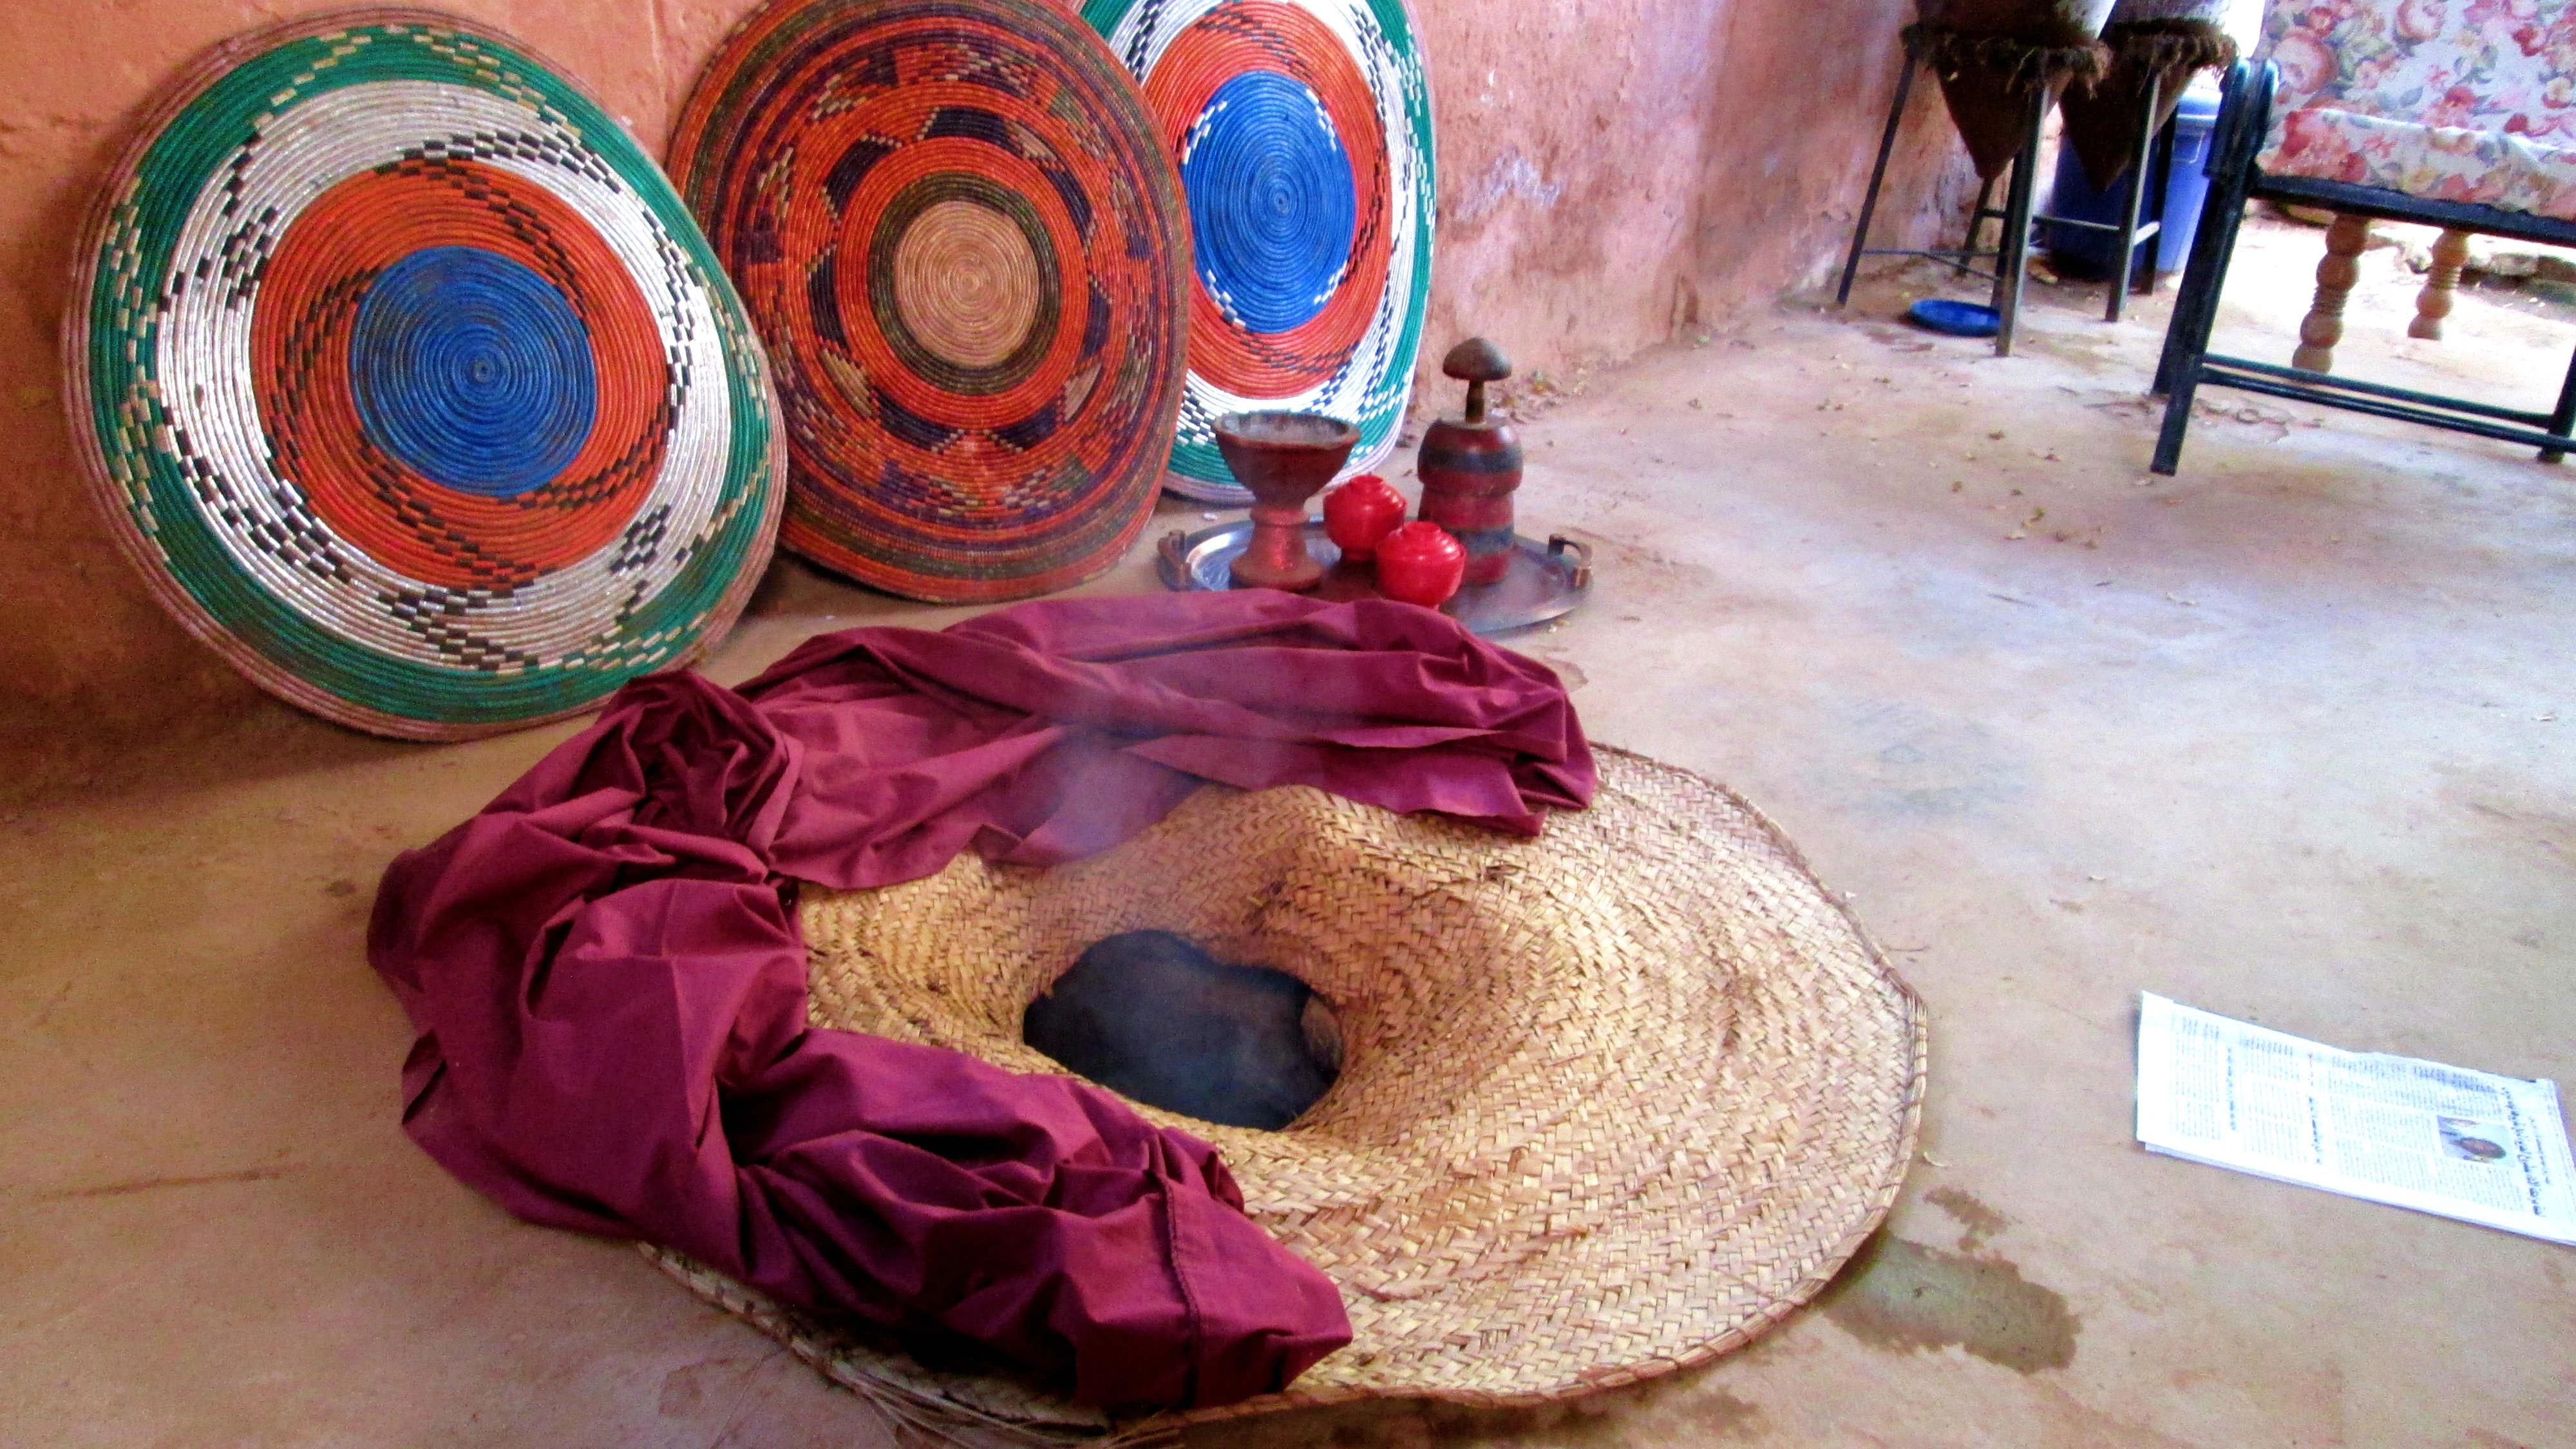 Sudanese wedding rituals and traditions - Dukhaninsudan2 Jpg A Traditional Dukhan In Sudan